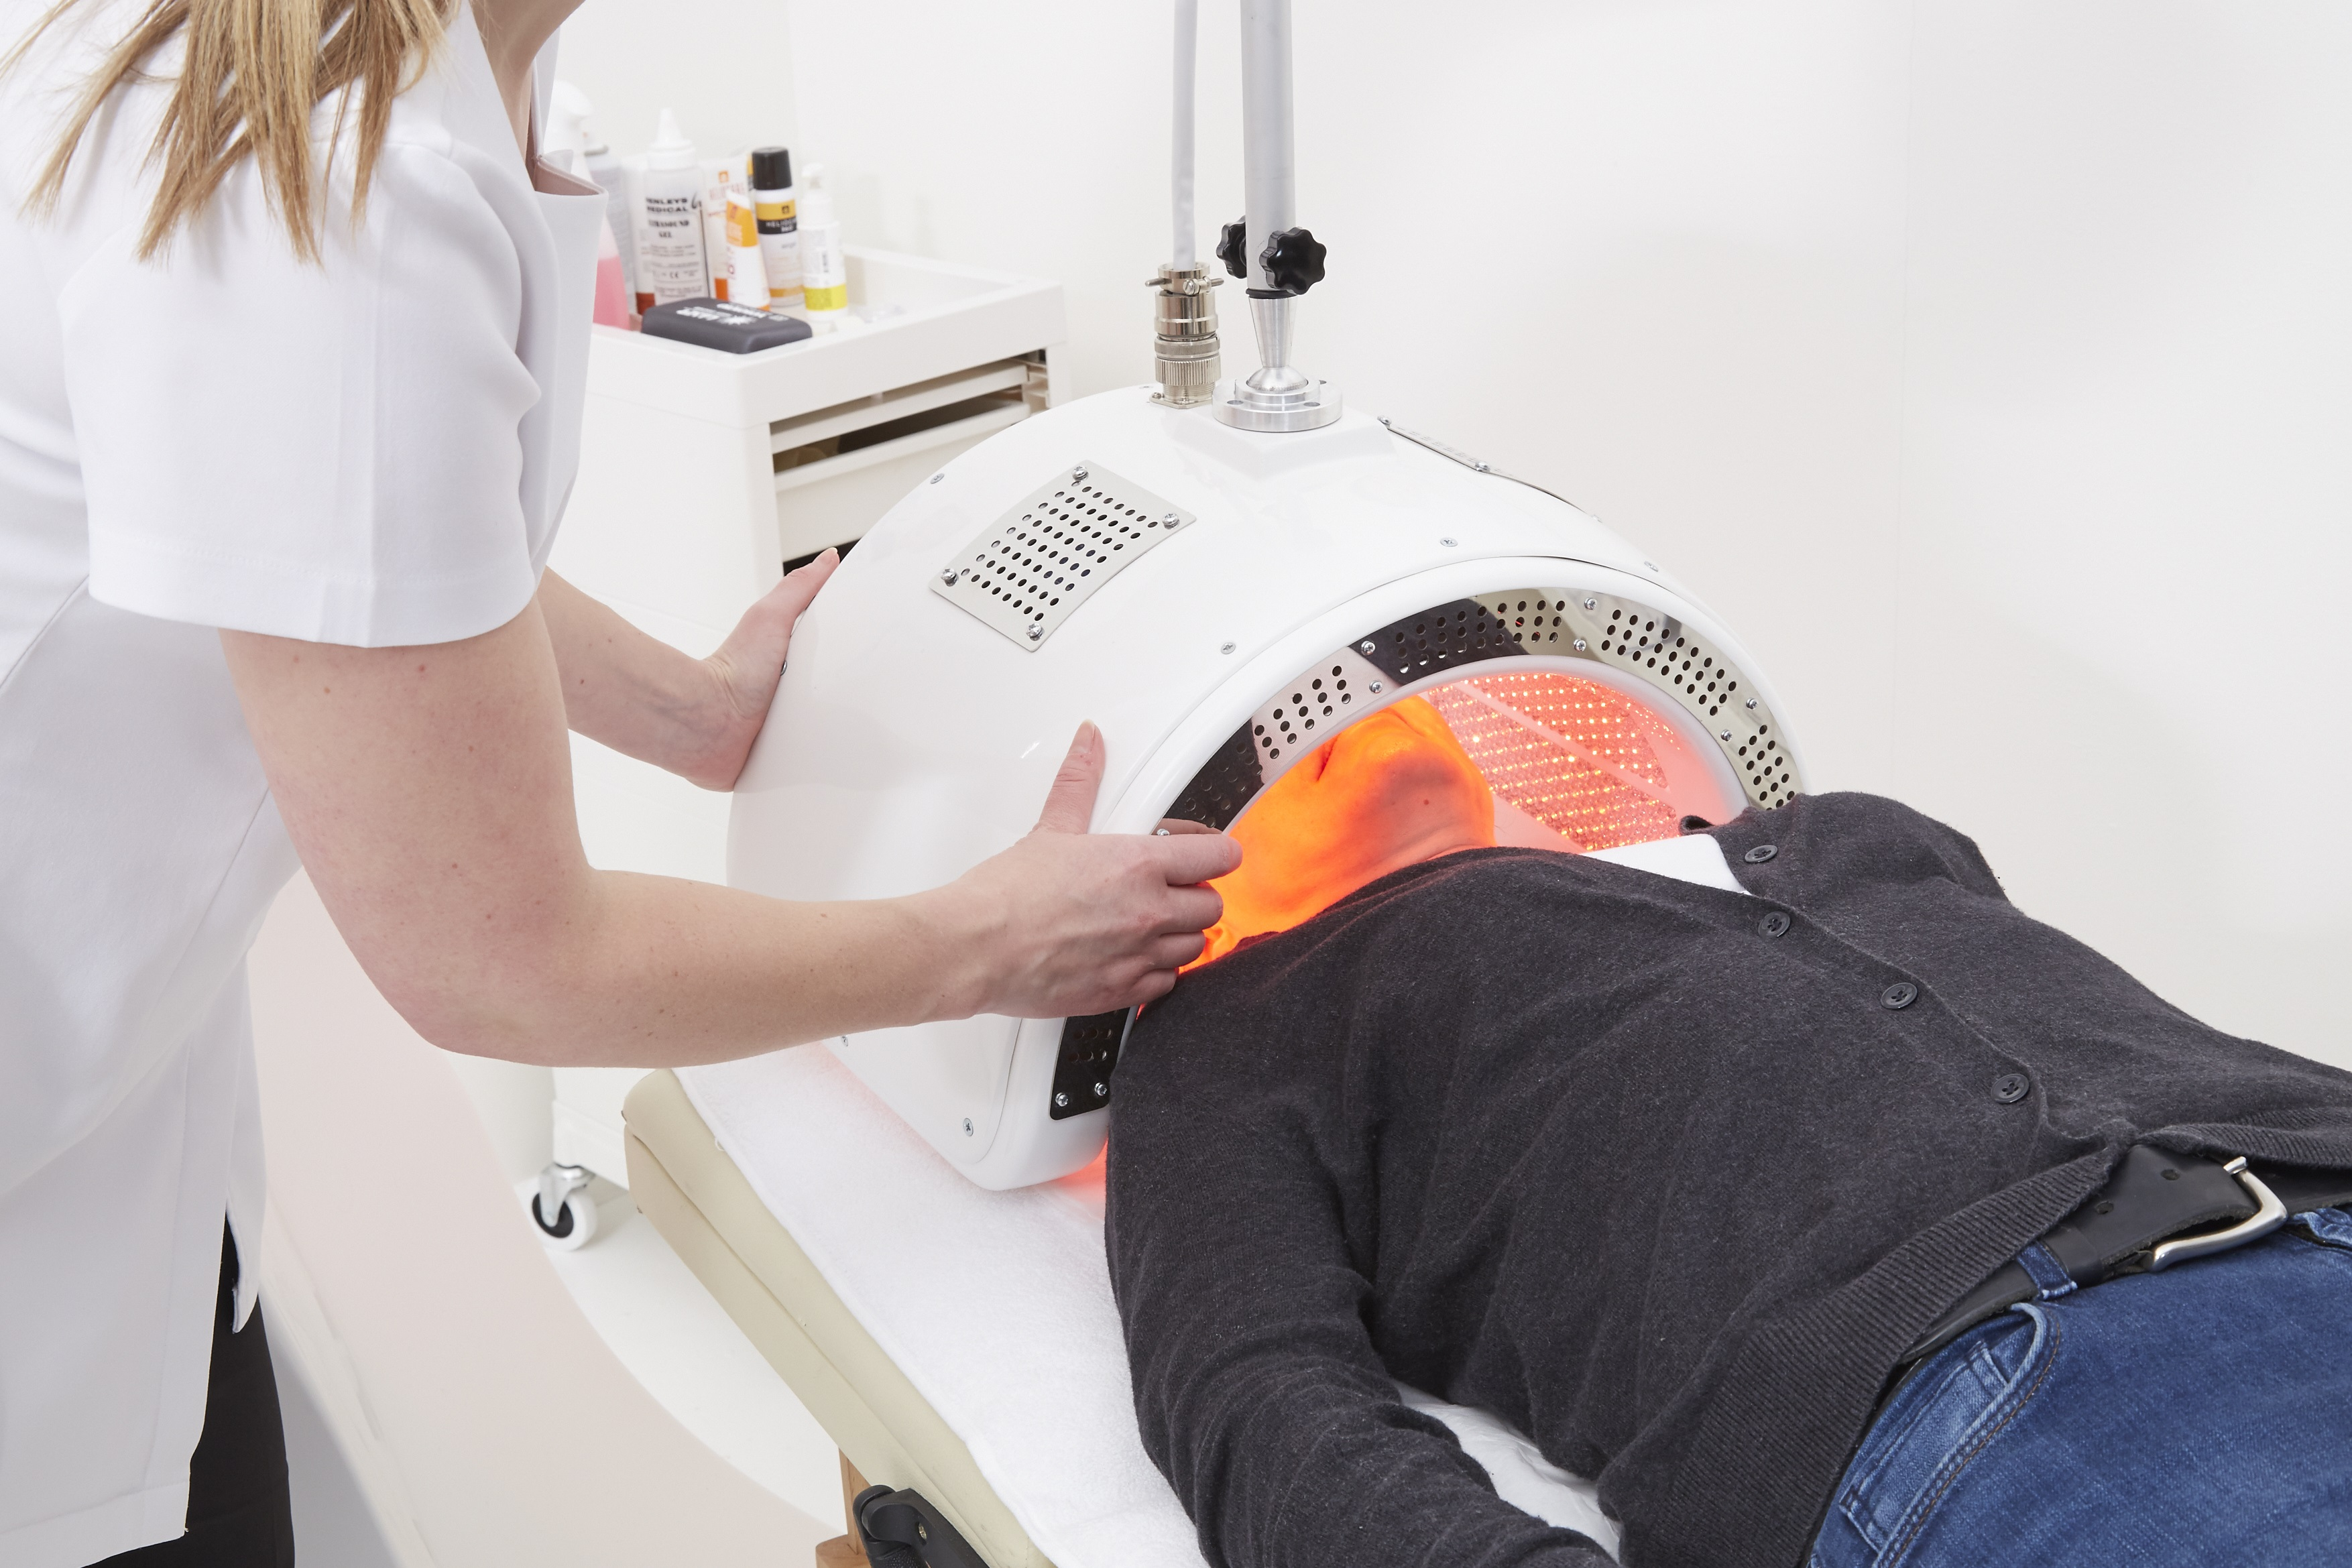 Treatment Image 1